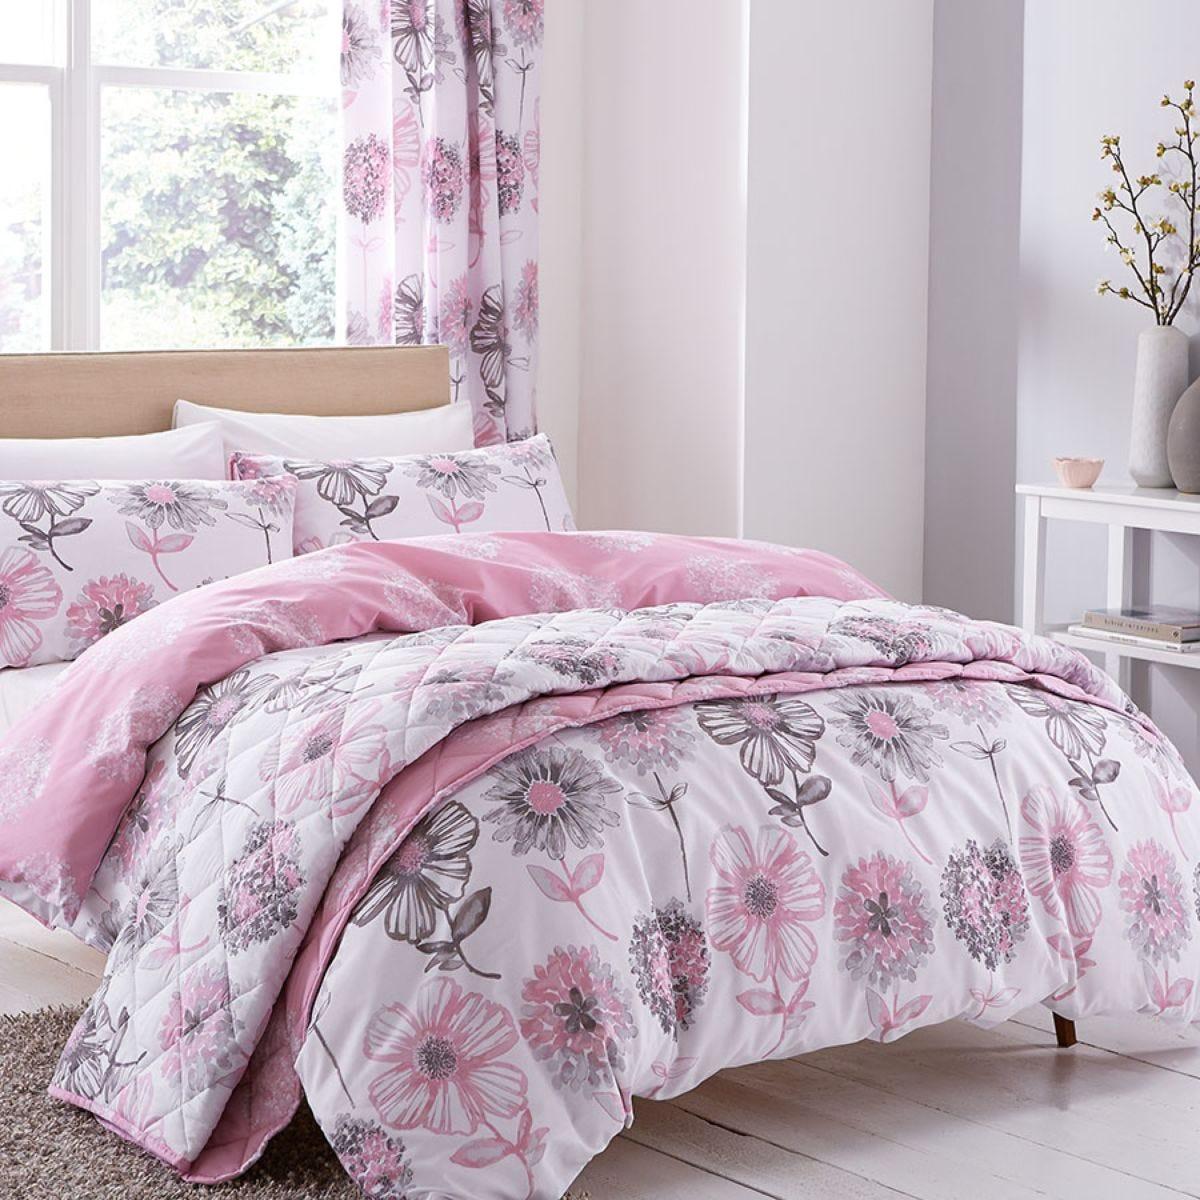 Catherine Lansfield Banbury Floral Duvet Set - Pink